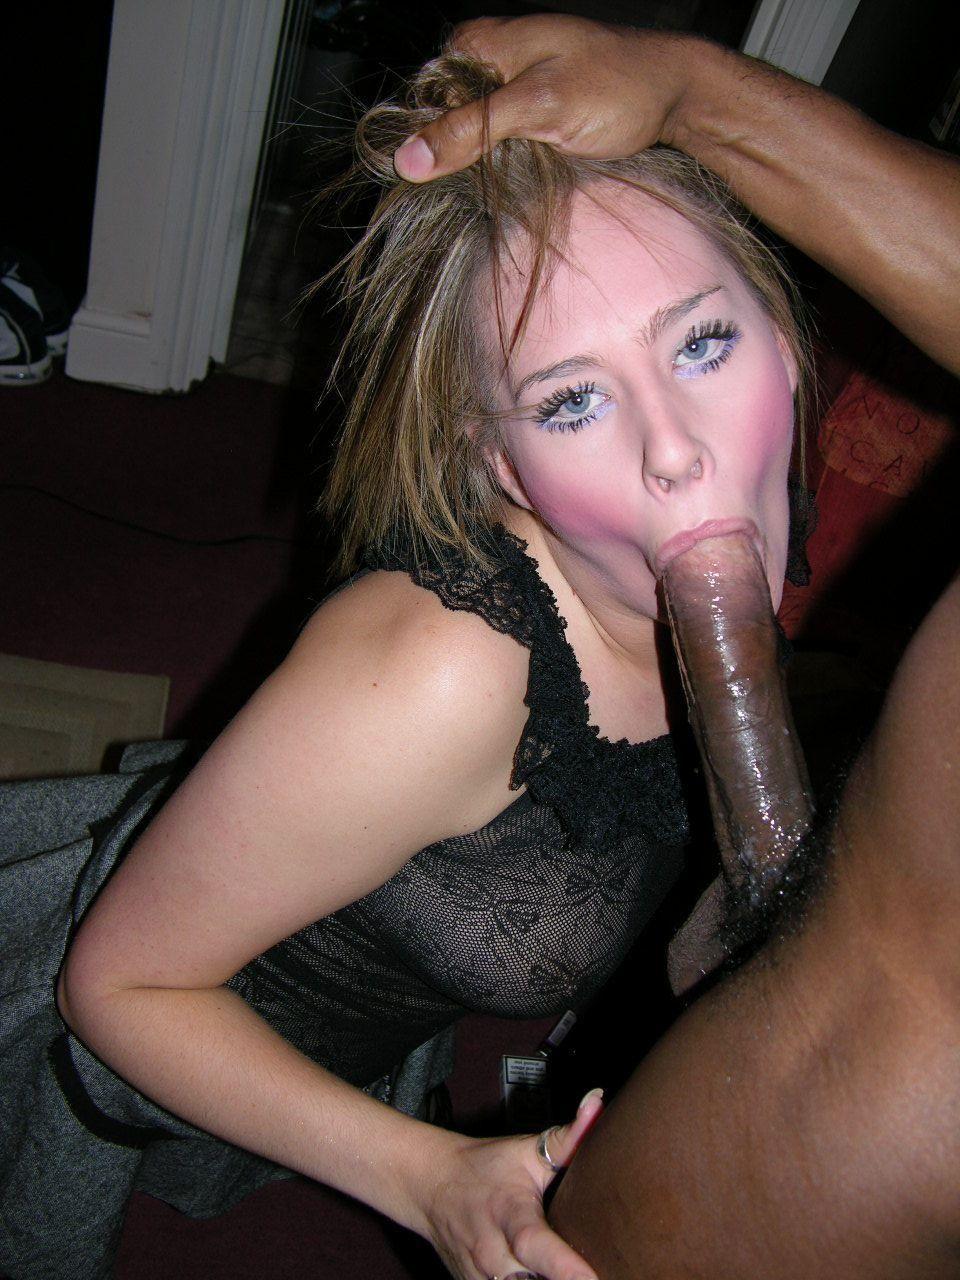 Plump wife alexsis sweet fucks her hot ass with a dildo 9